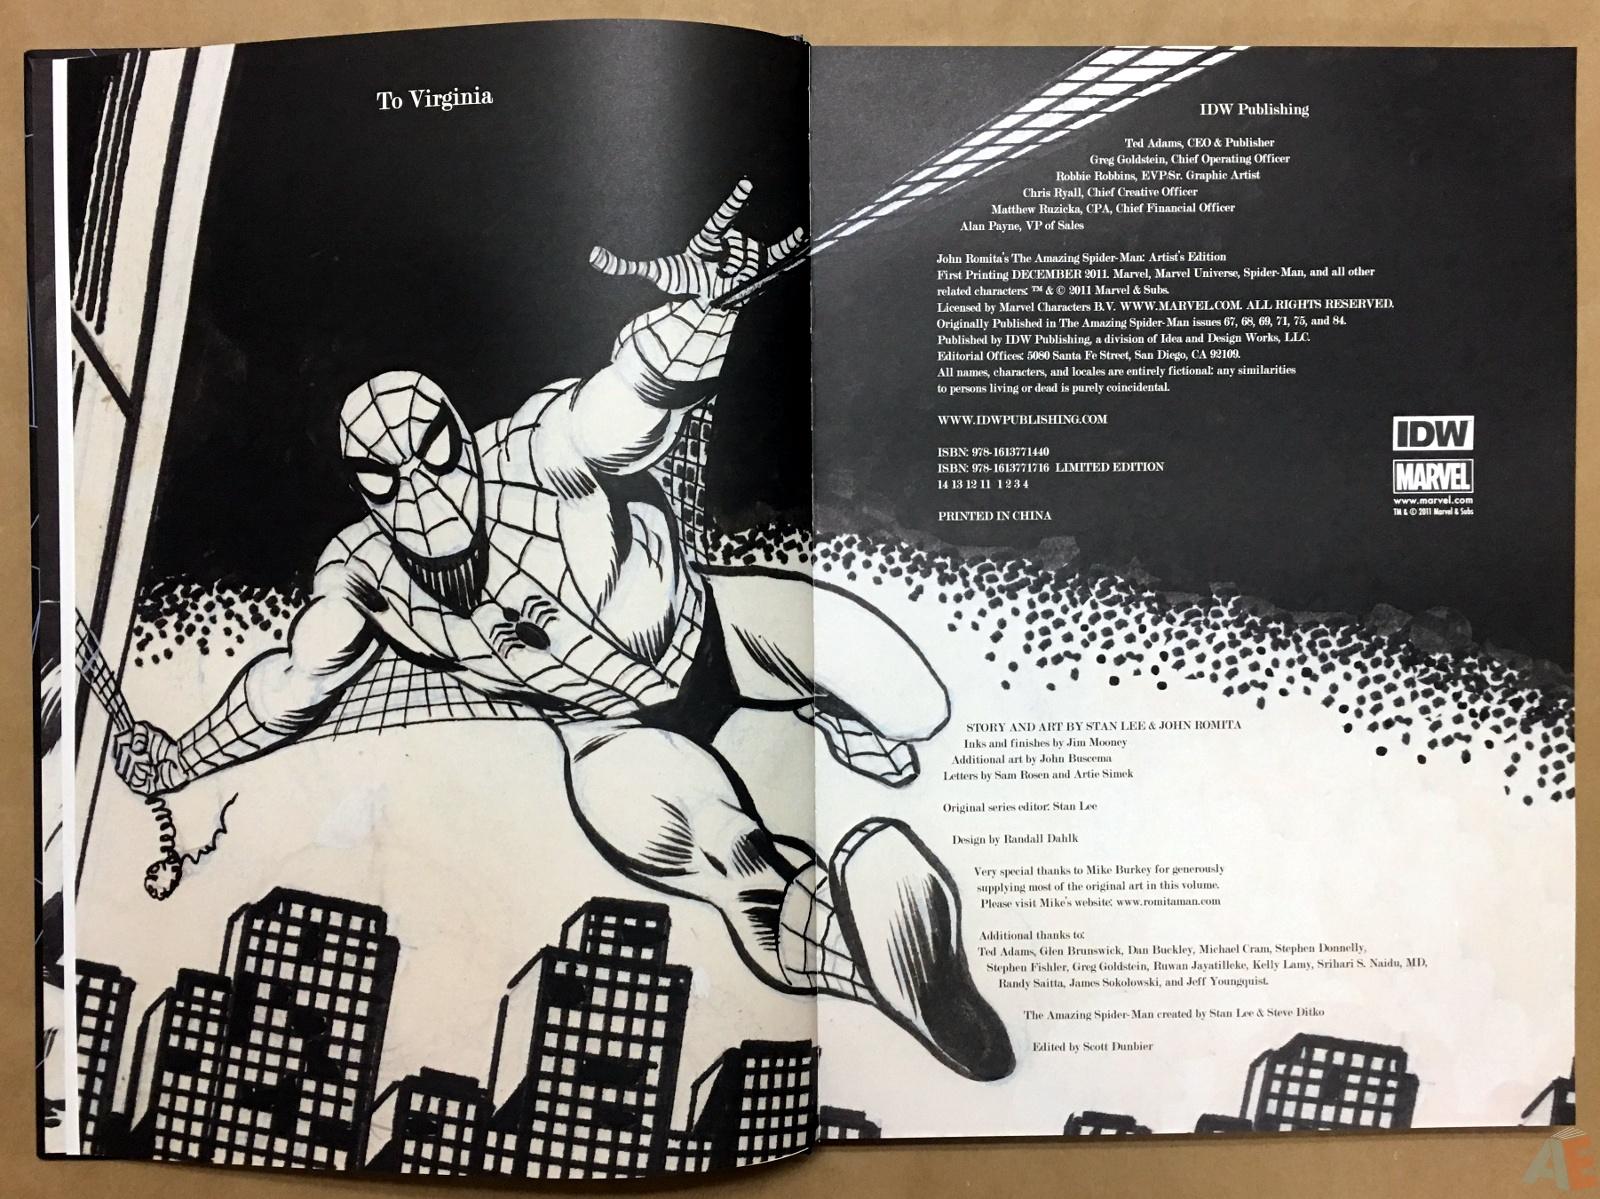 John Romita's The Amazing Spider-Man Artist's Edition 4